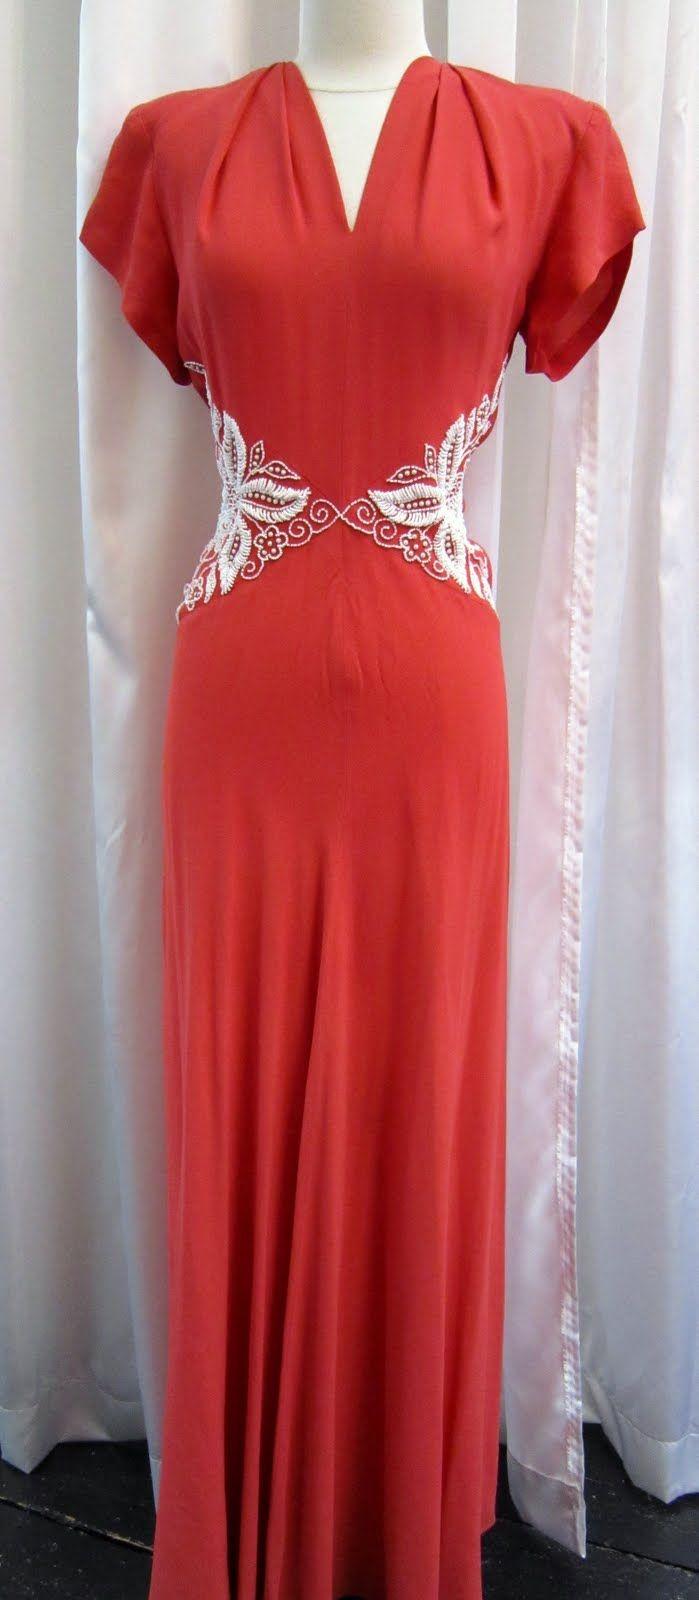 S purple u white tulle prom dress s pistachio ruffle tiered